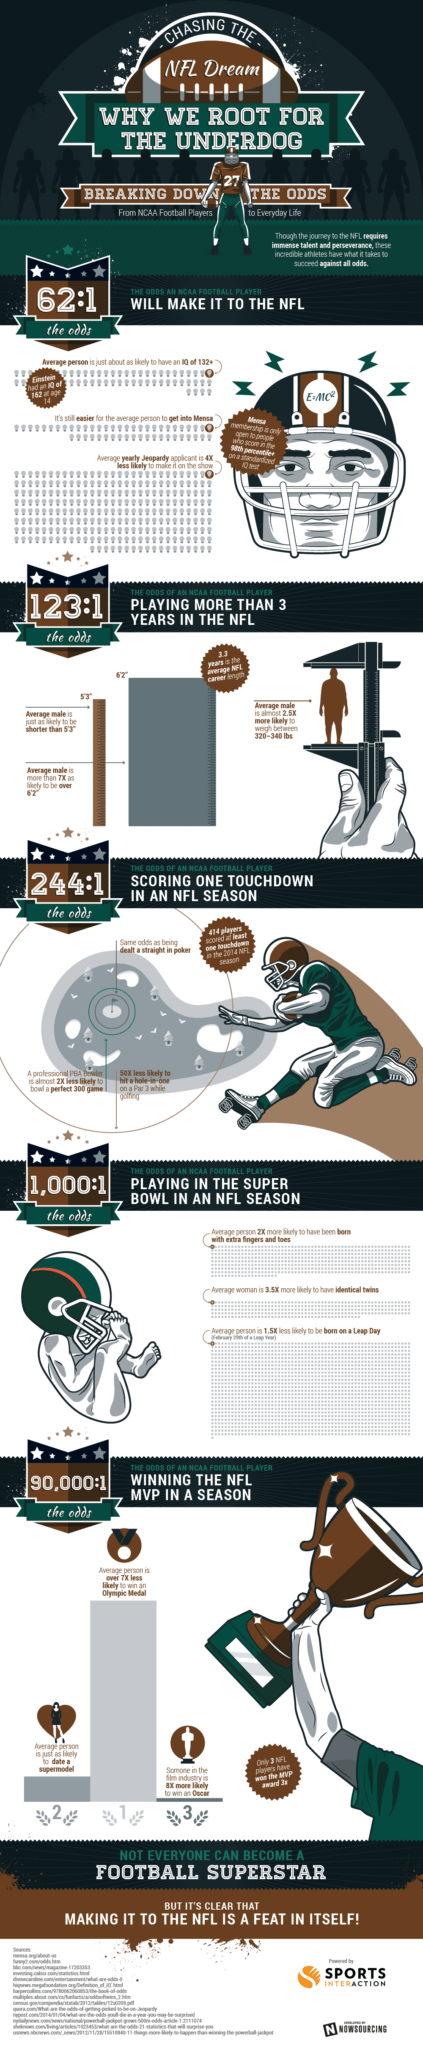 nfl-odds-comparison-infographic